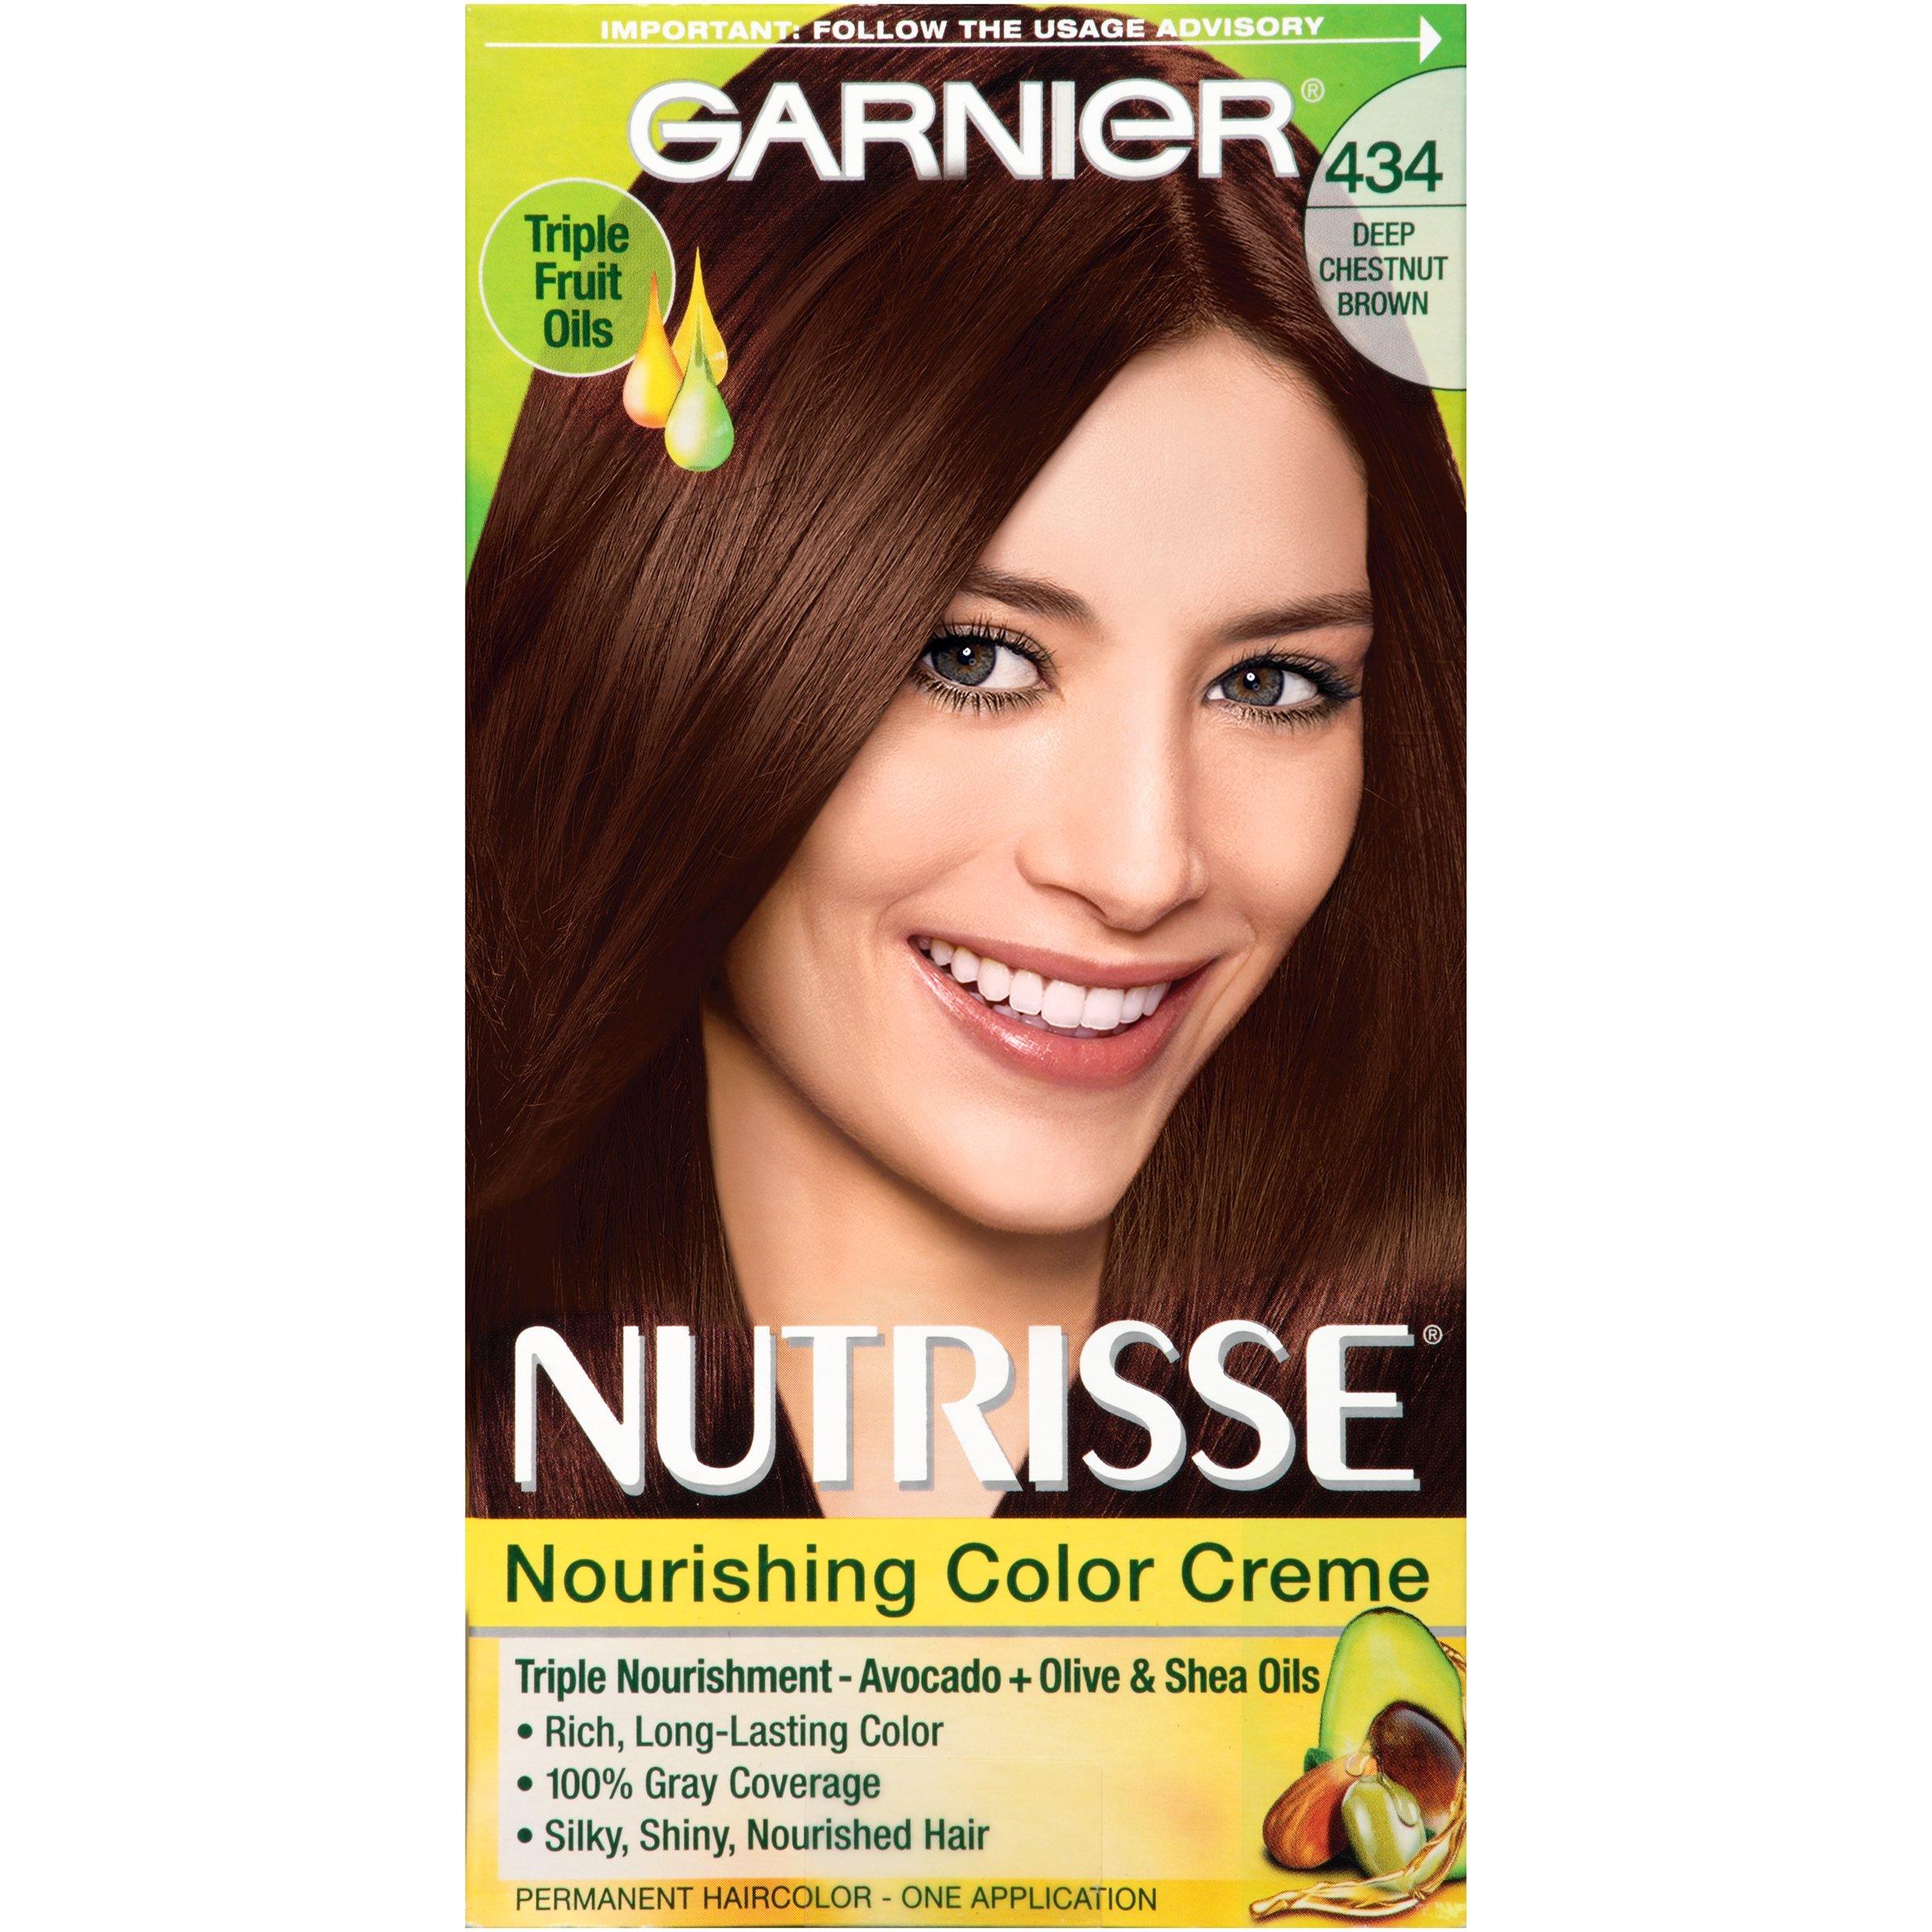 Amazon.com: Garnier Nutrisse Nourishing Hair Color Creme, 50 Medium Natural Brown Truffle